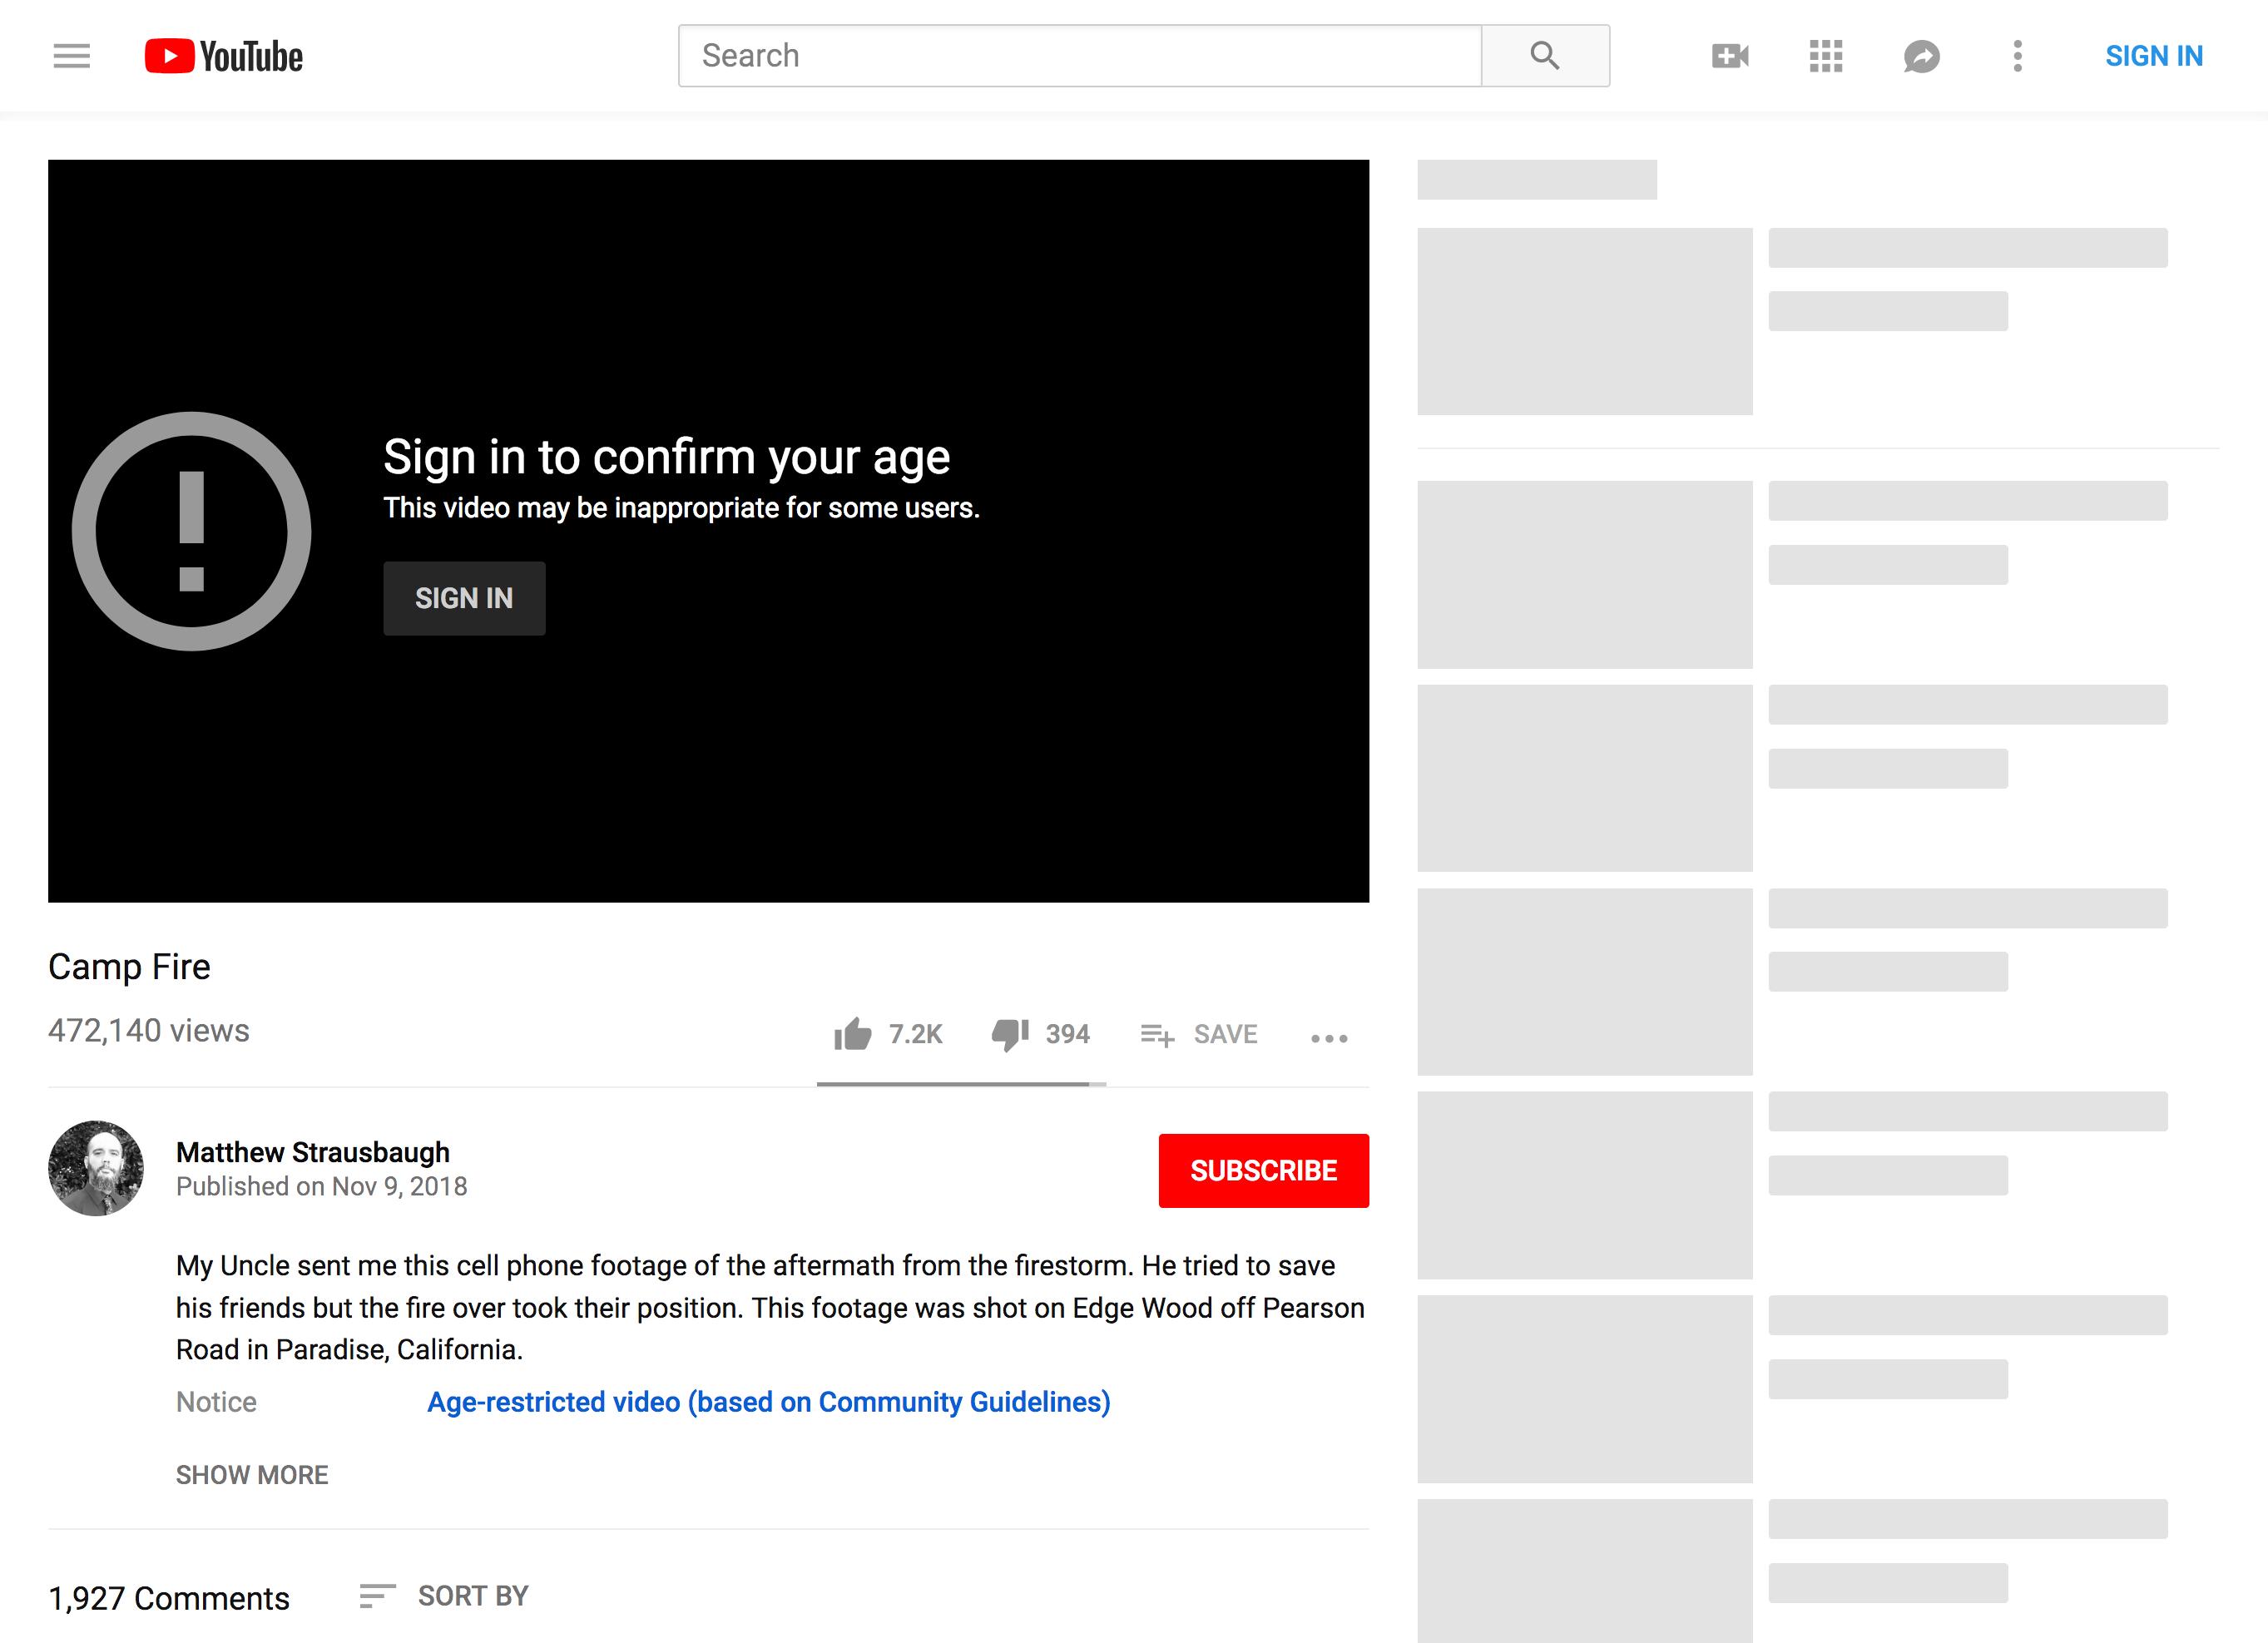 youtube com - Youtube Viewer discretion